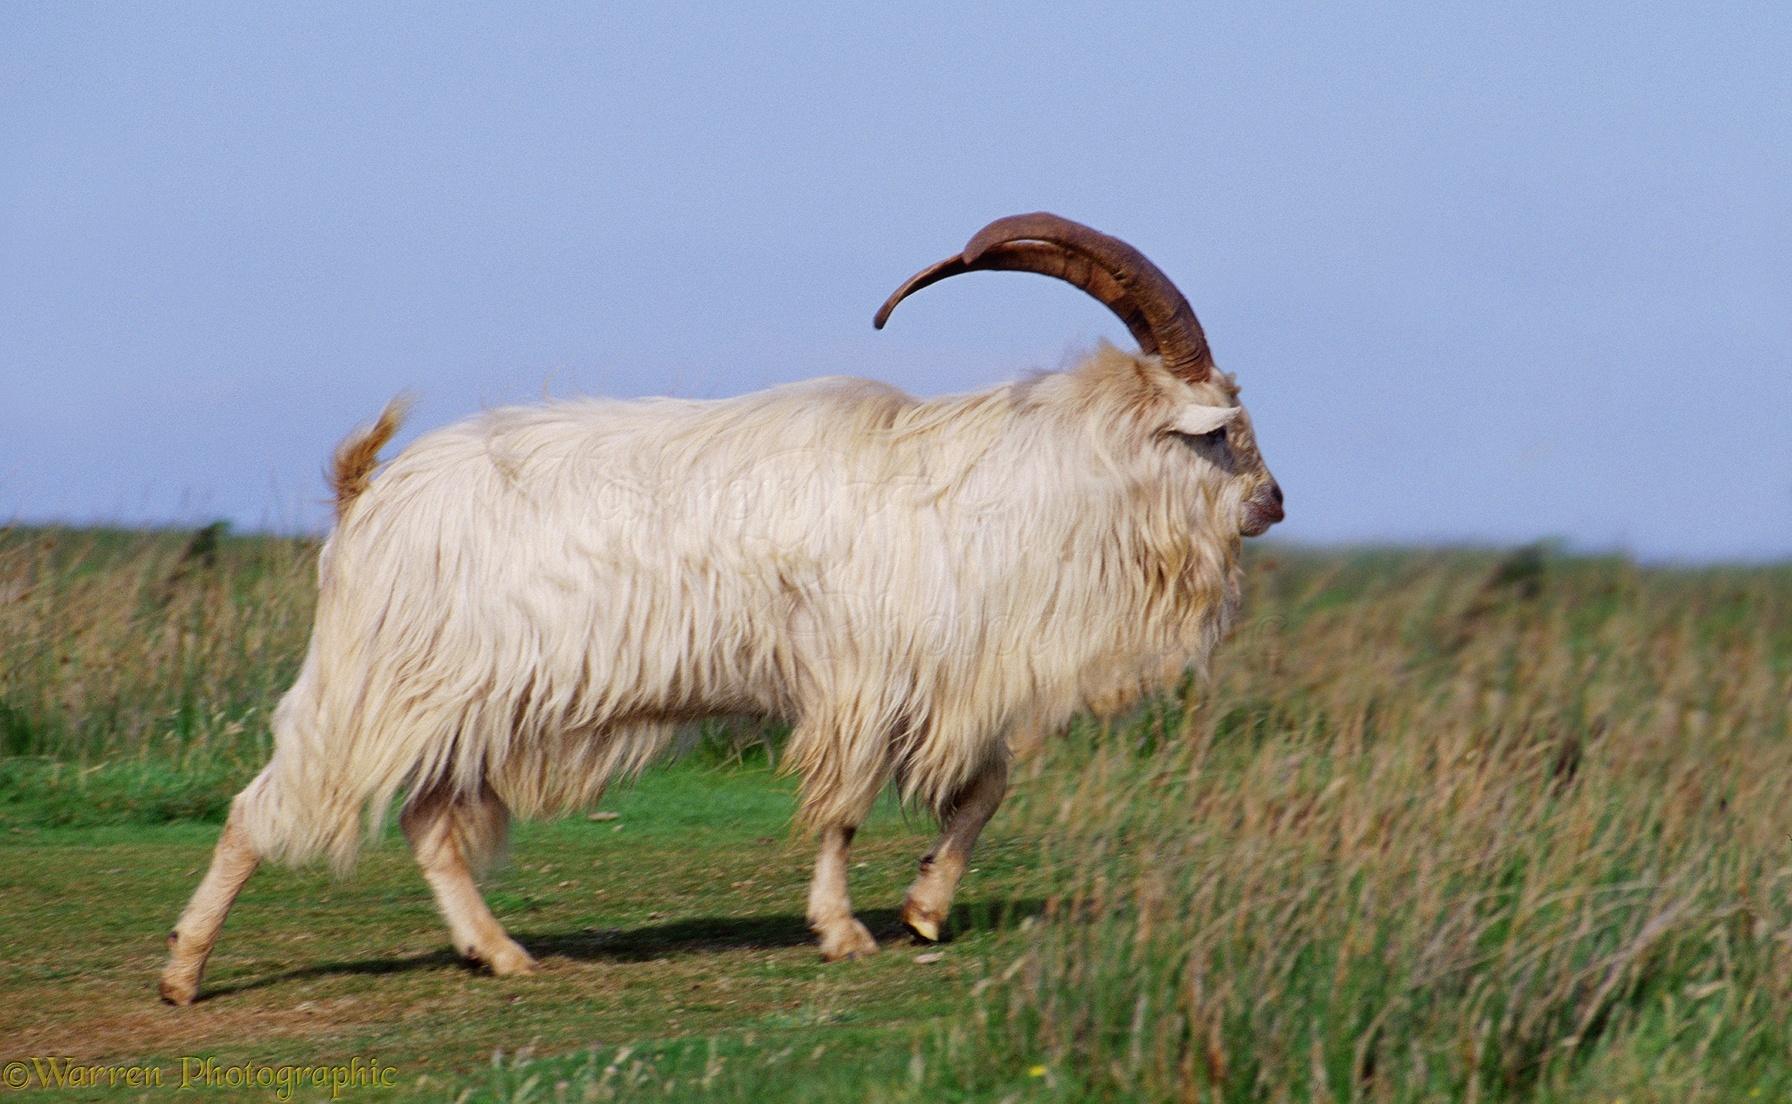 White Goat Photo Wp04072